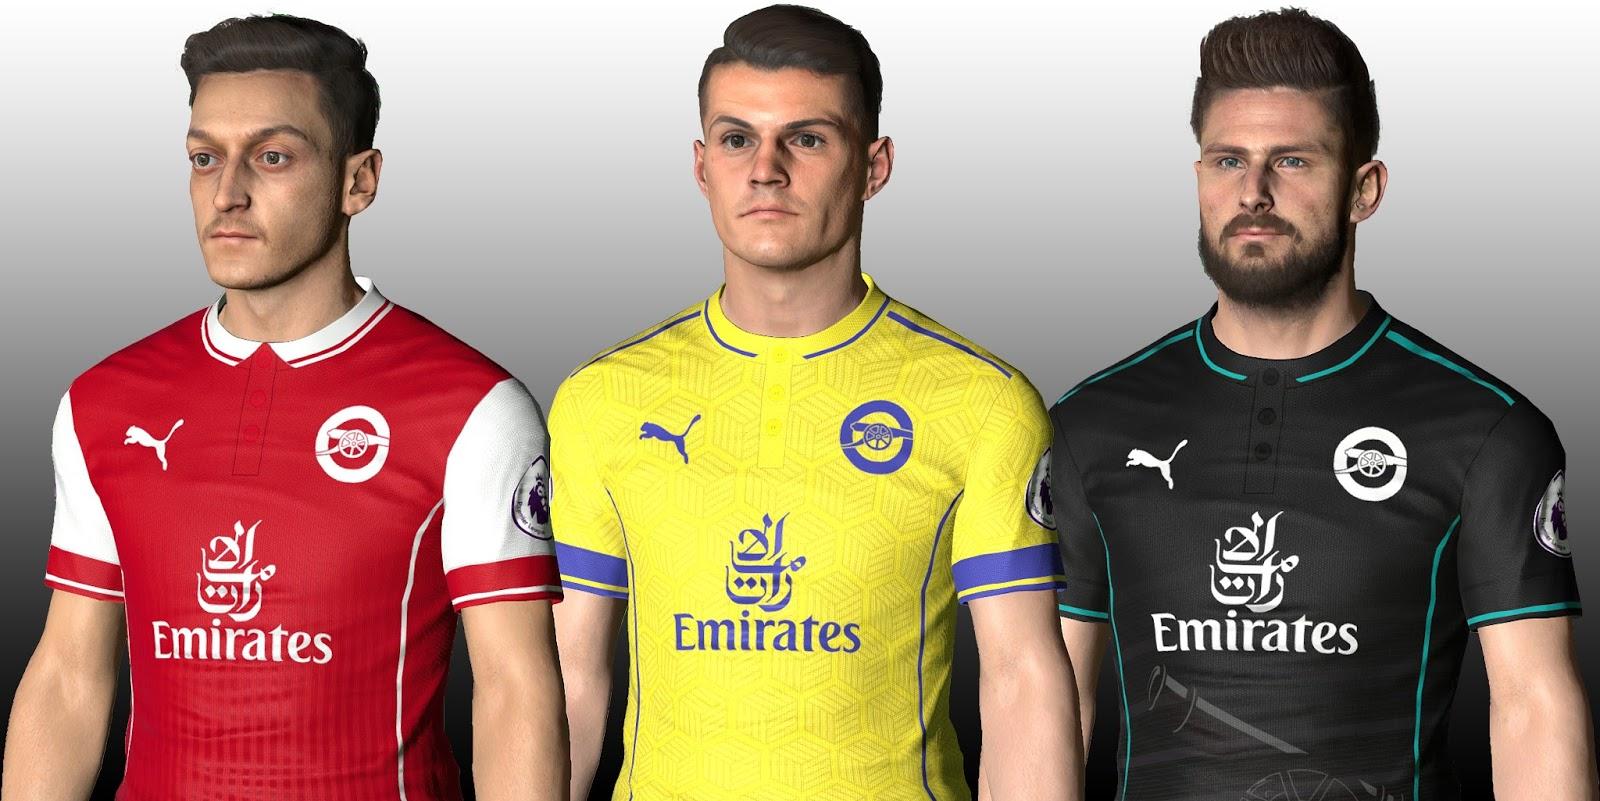 Pes-modif: PES 2017 Arsenal FC Fantasy Kits V1 By IDK